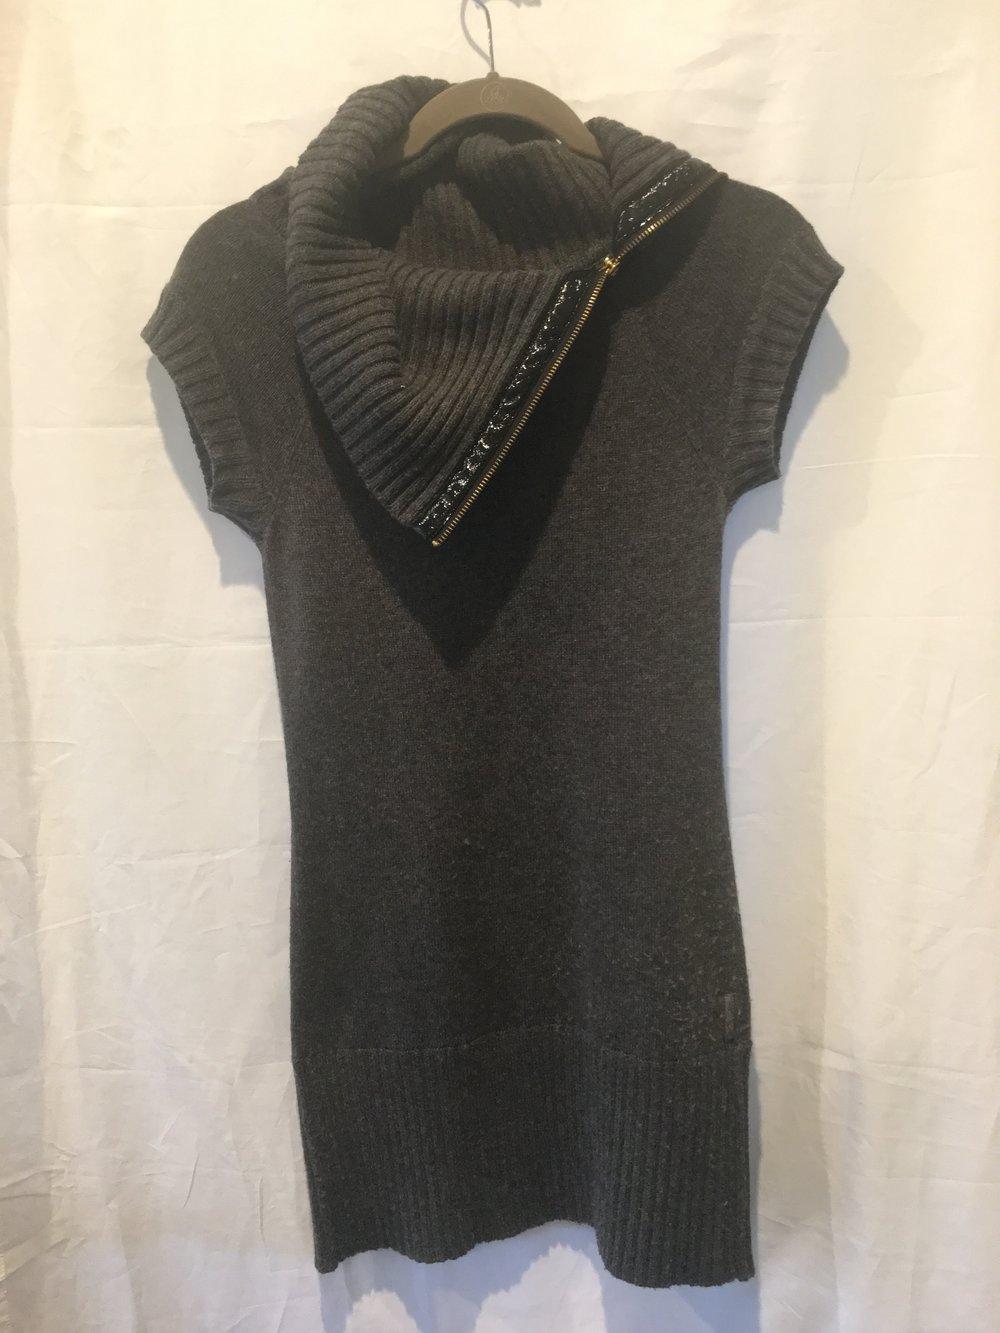 Cowlneck Gray Sweaterdress.jpg